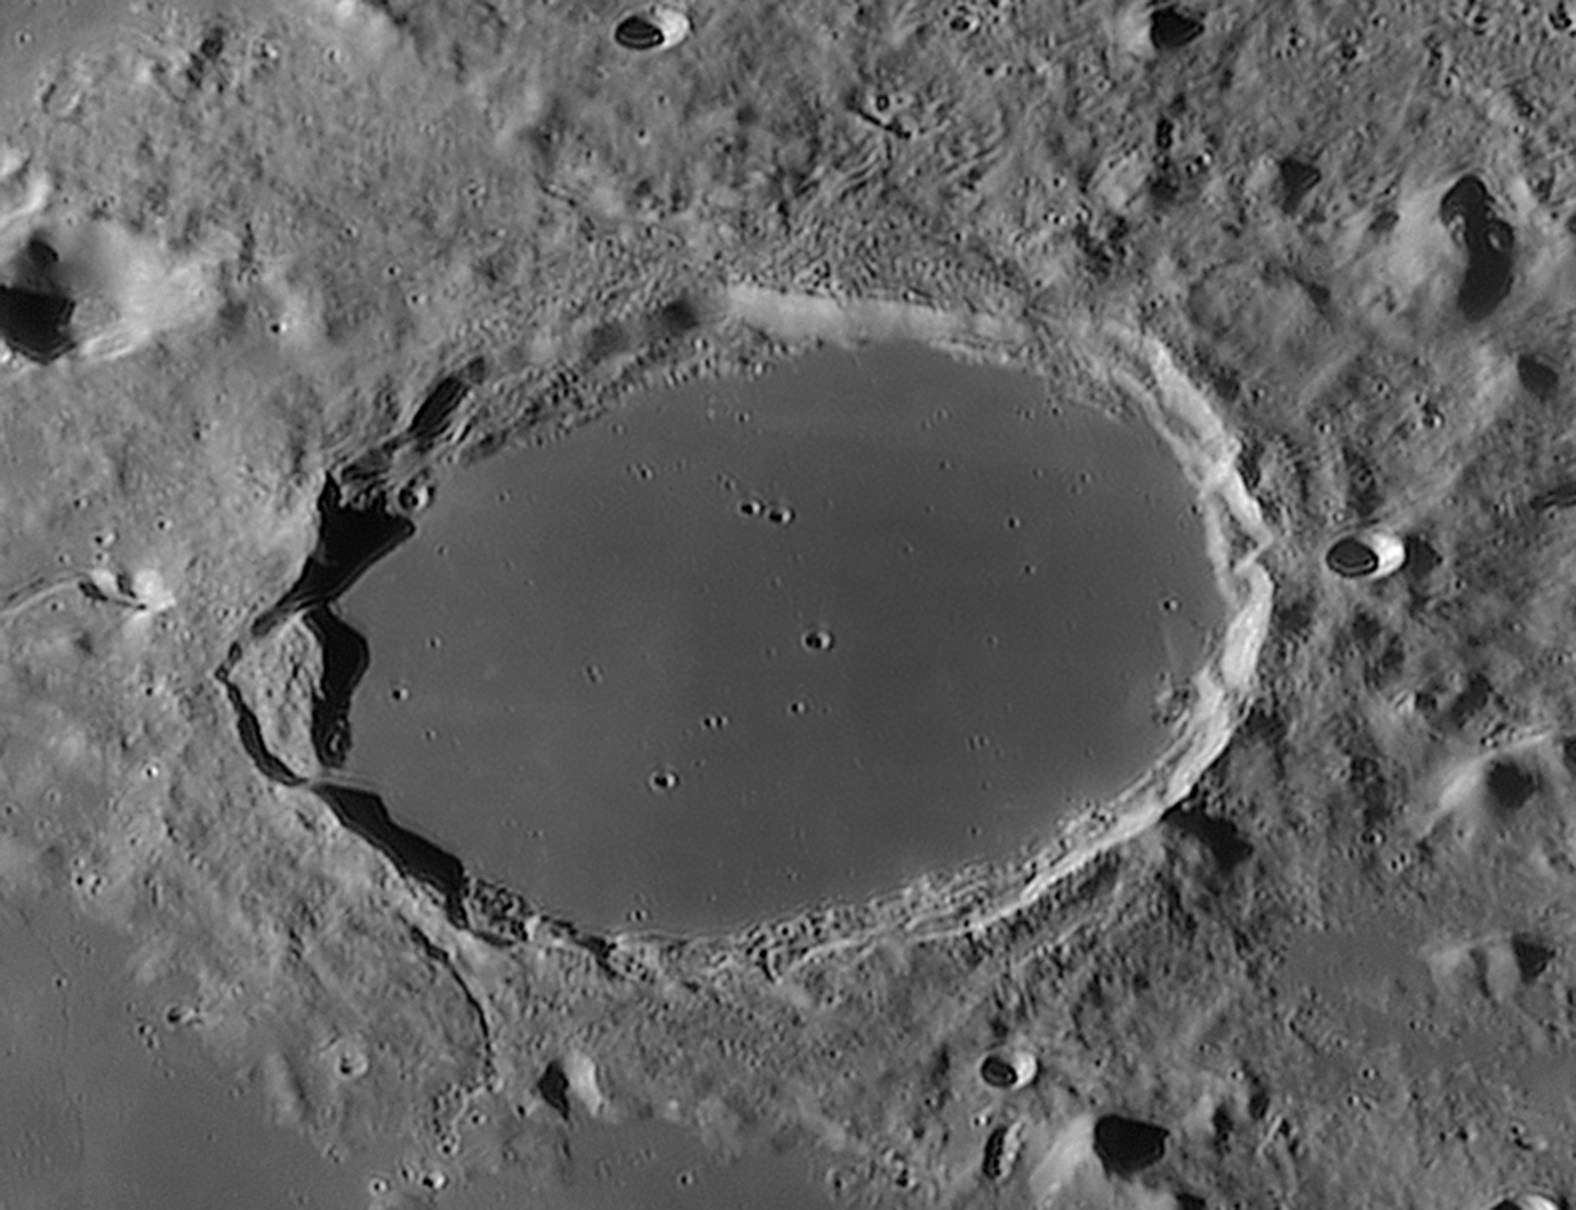 large.lune__2015-08-06_t_05-24com.jpg.562c6b23b7f459ab53b31623fc383eba.jpg